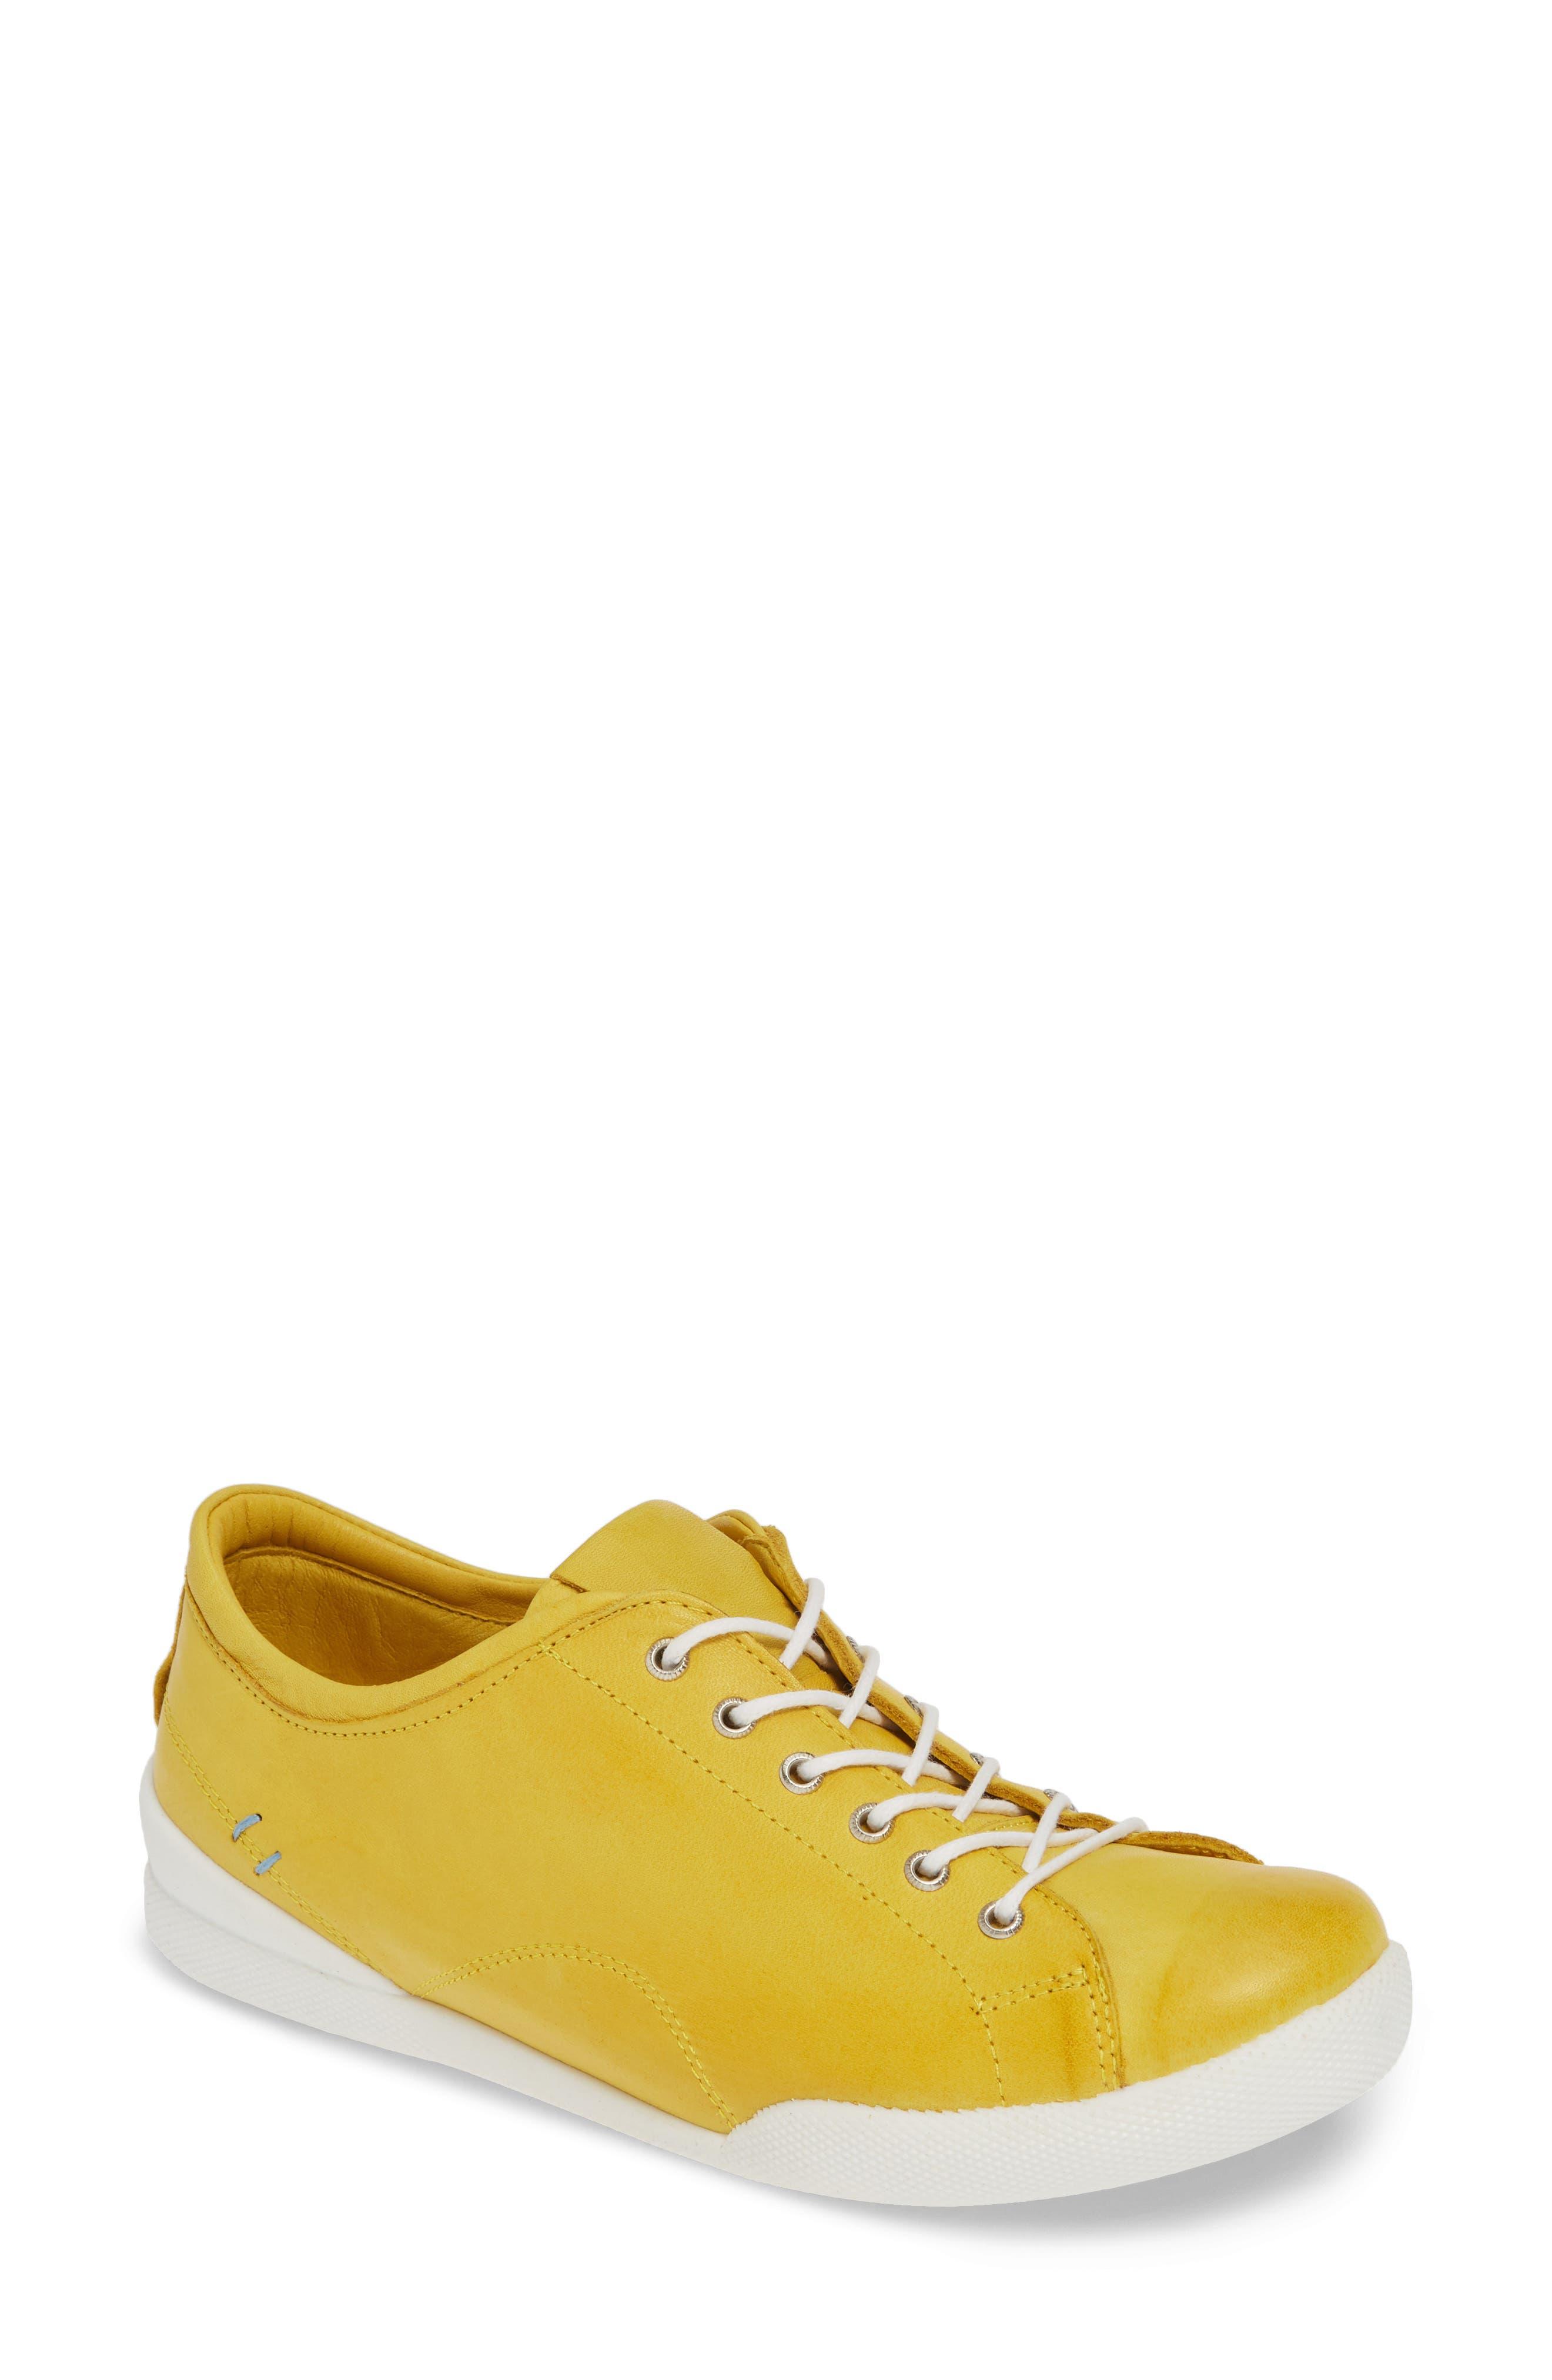 Sheridan Mia Abbey 2 Sneaker - Yellow